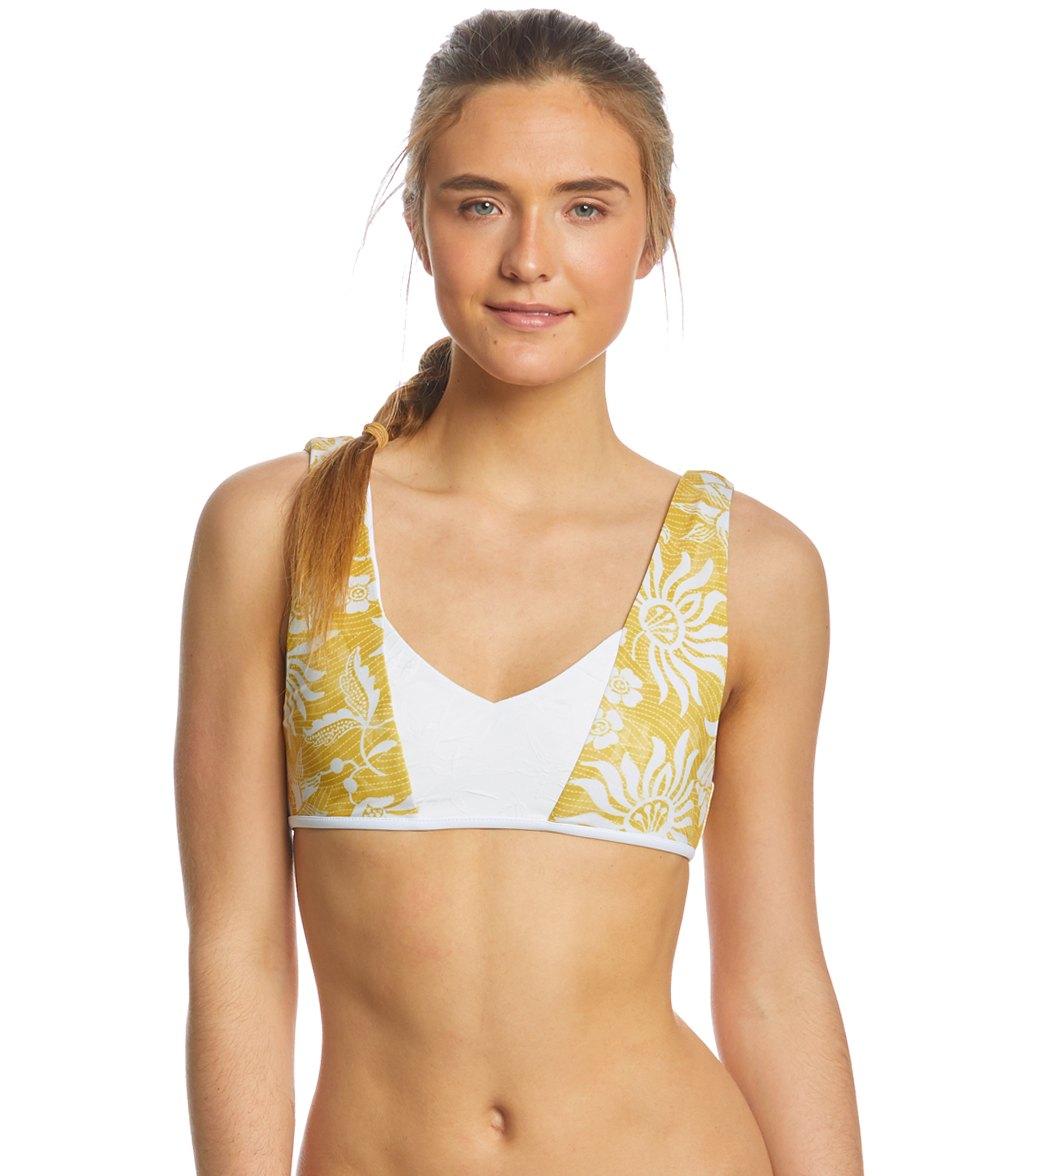 07e574e21c329 Seea Bamboo Milos Reversible Bikini Top at SwimOutlet.com - Free Shipping